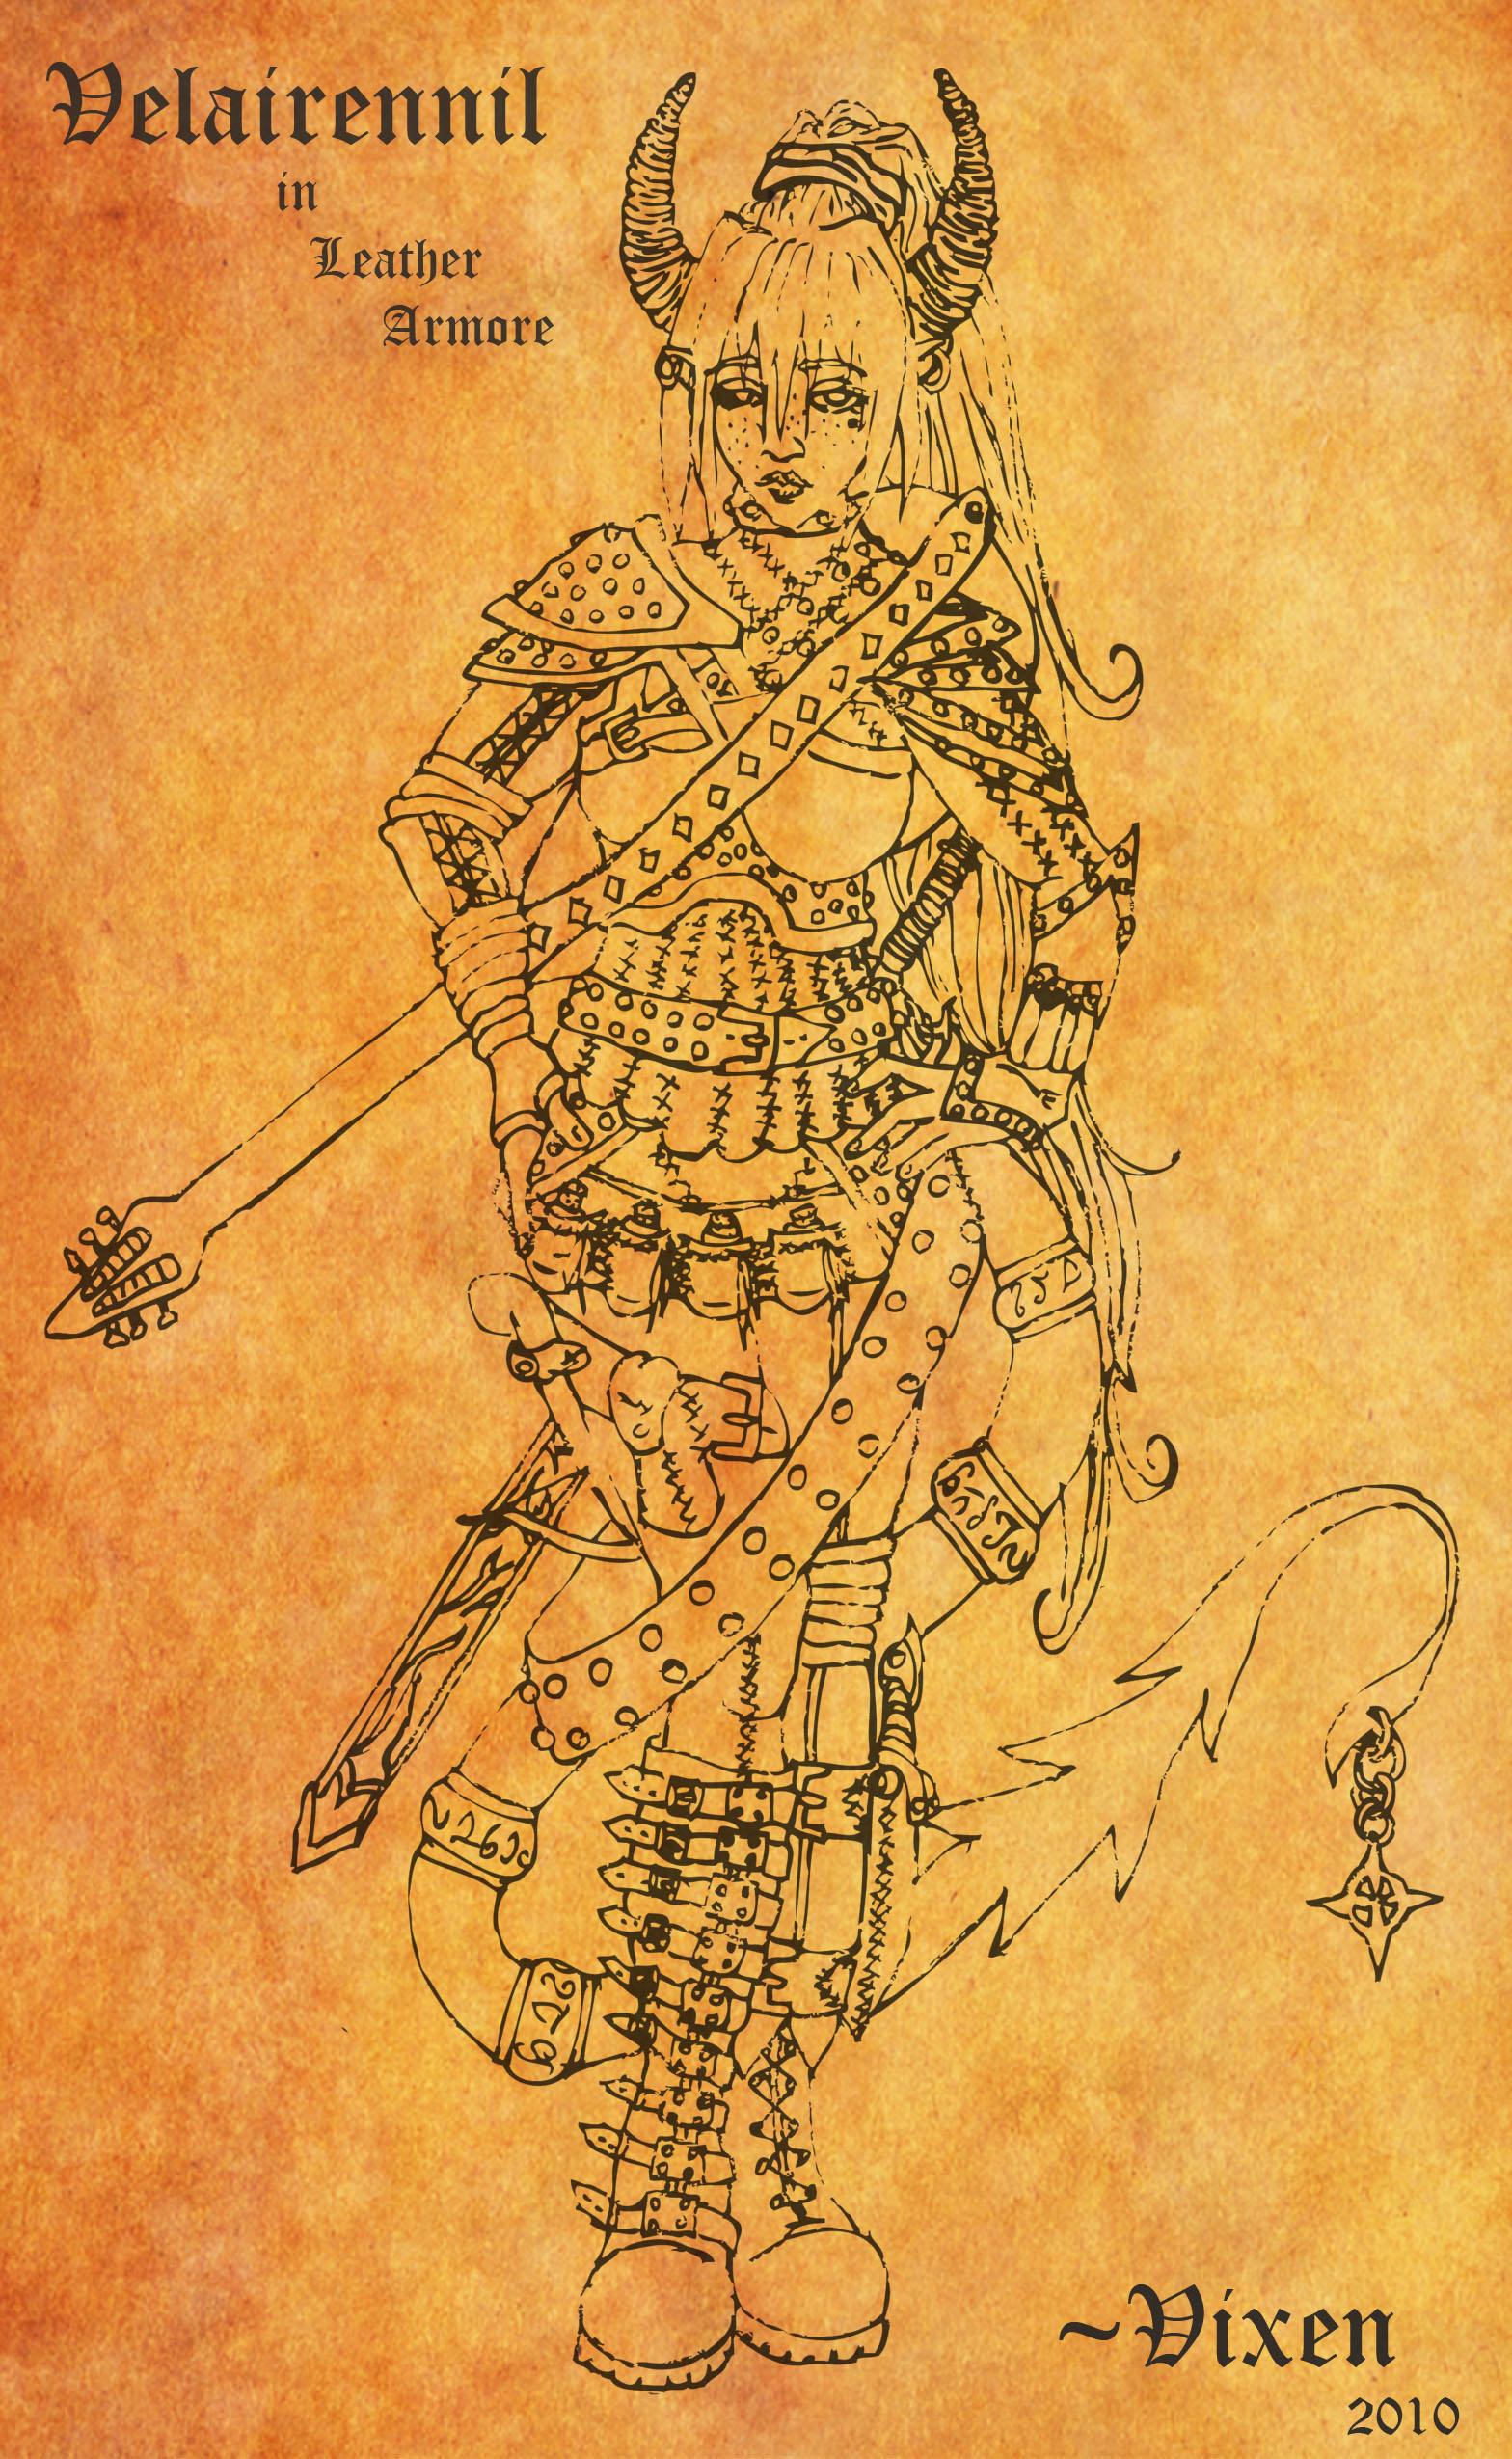 Velairennil- Leather Armore